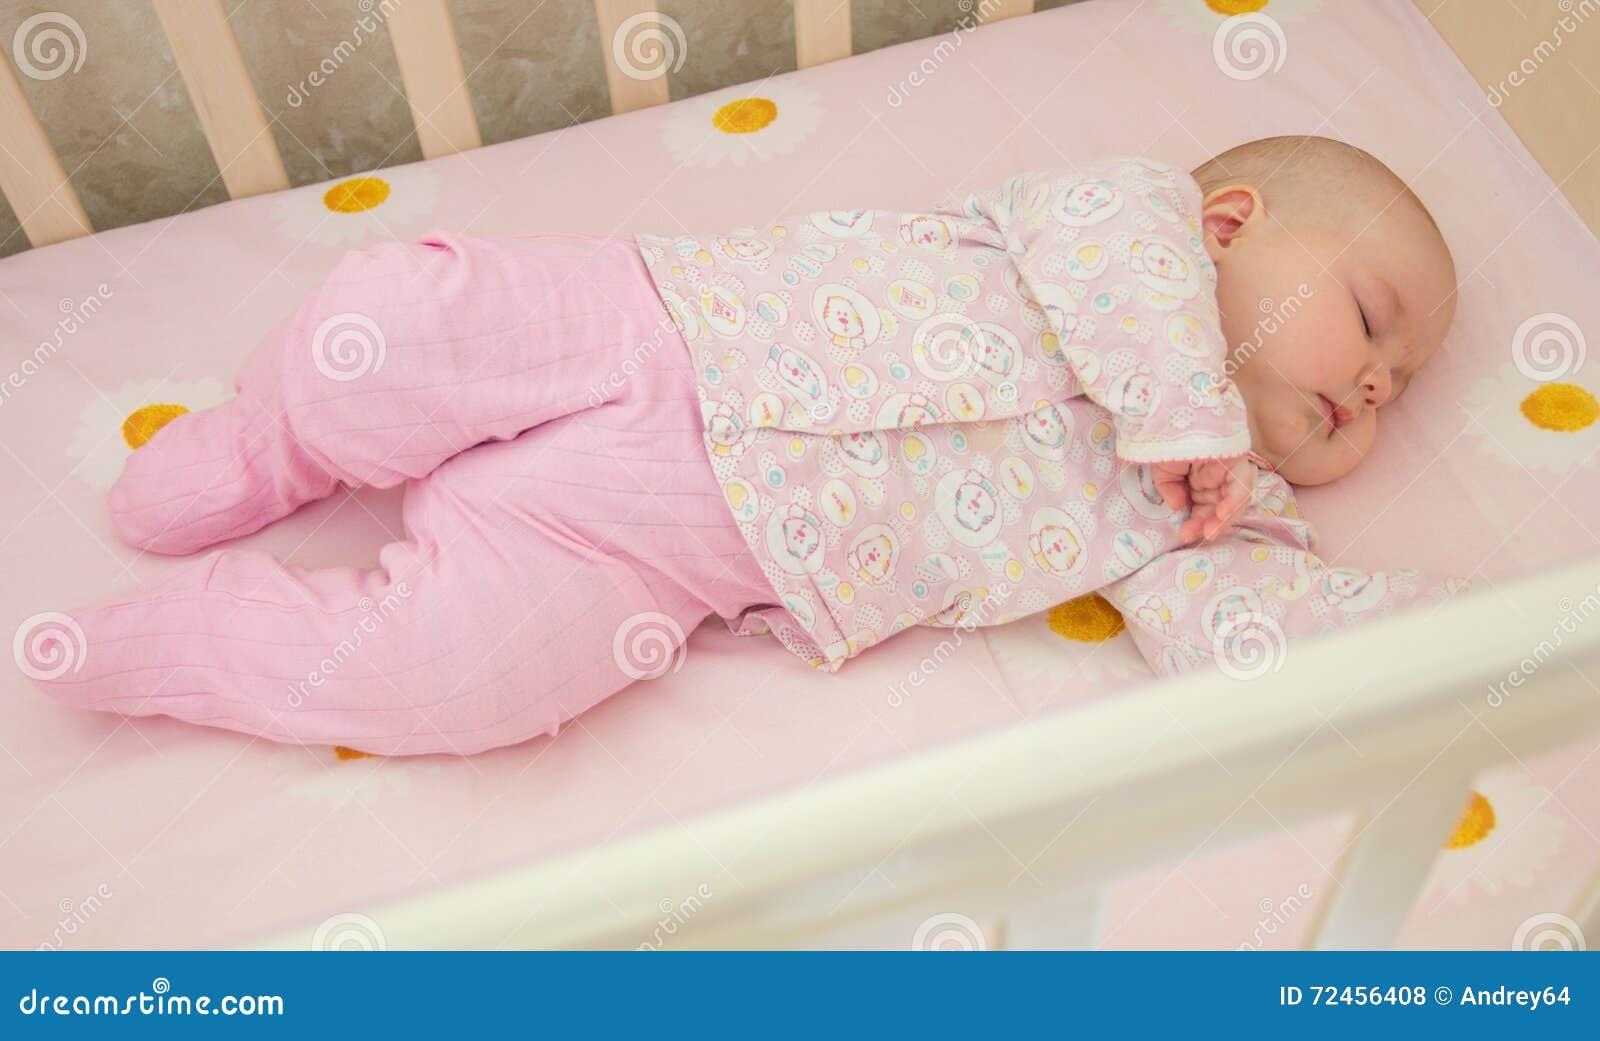 Zeer aardige zoete babyslaap in voederbak